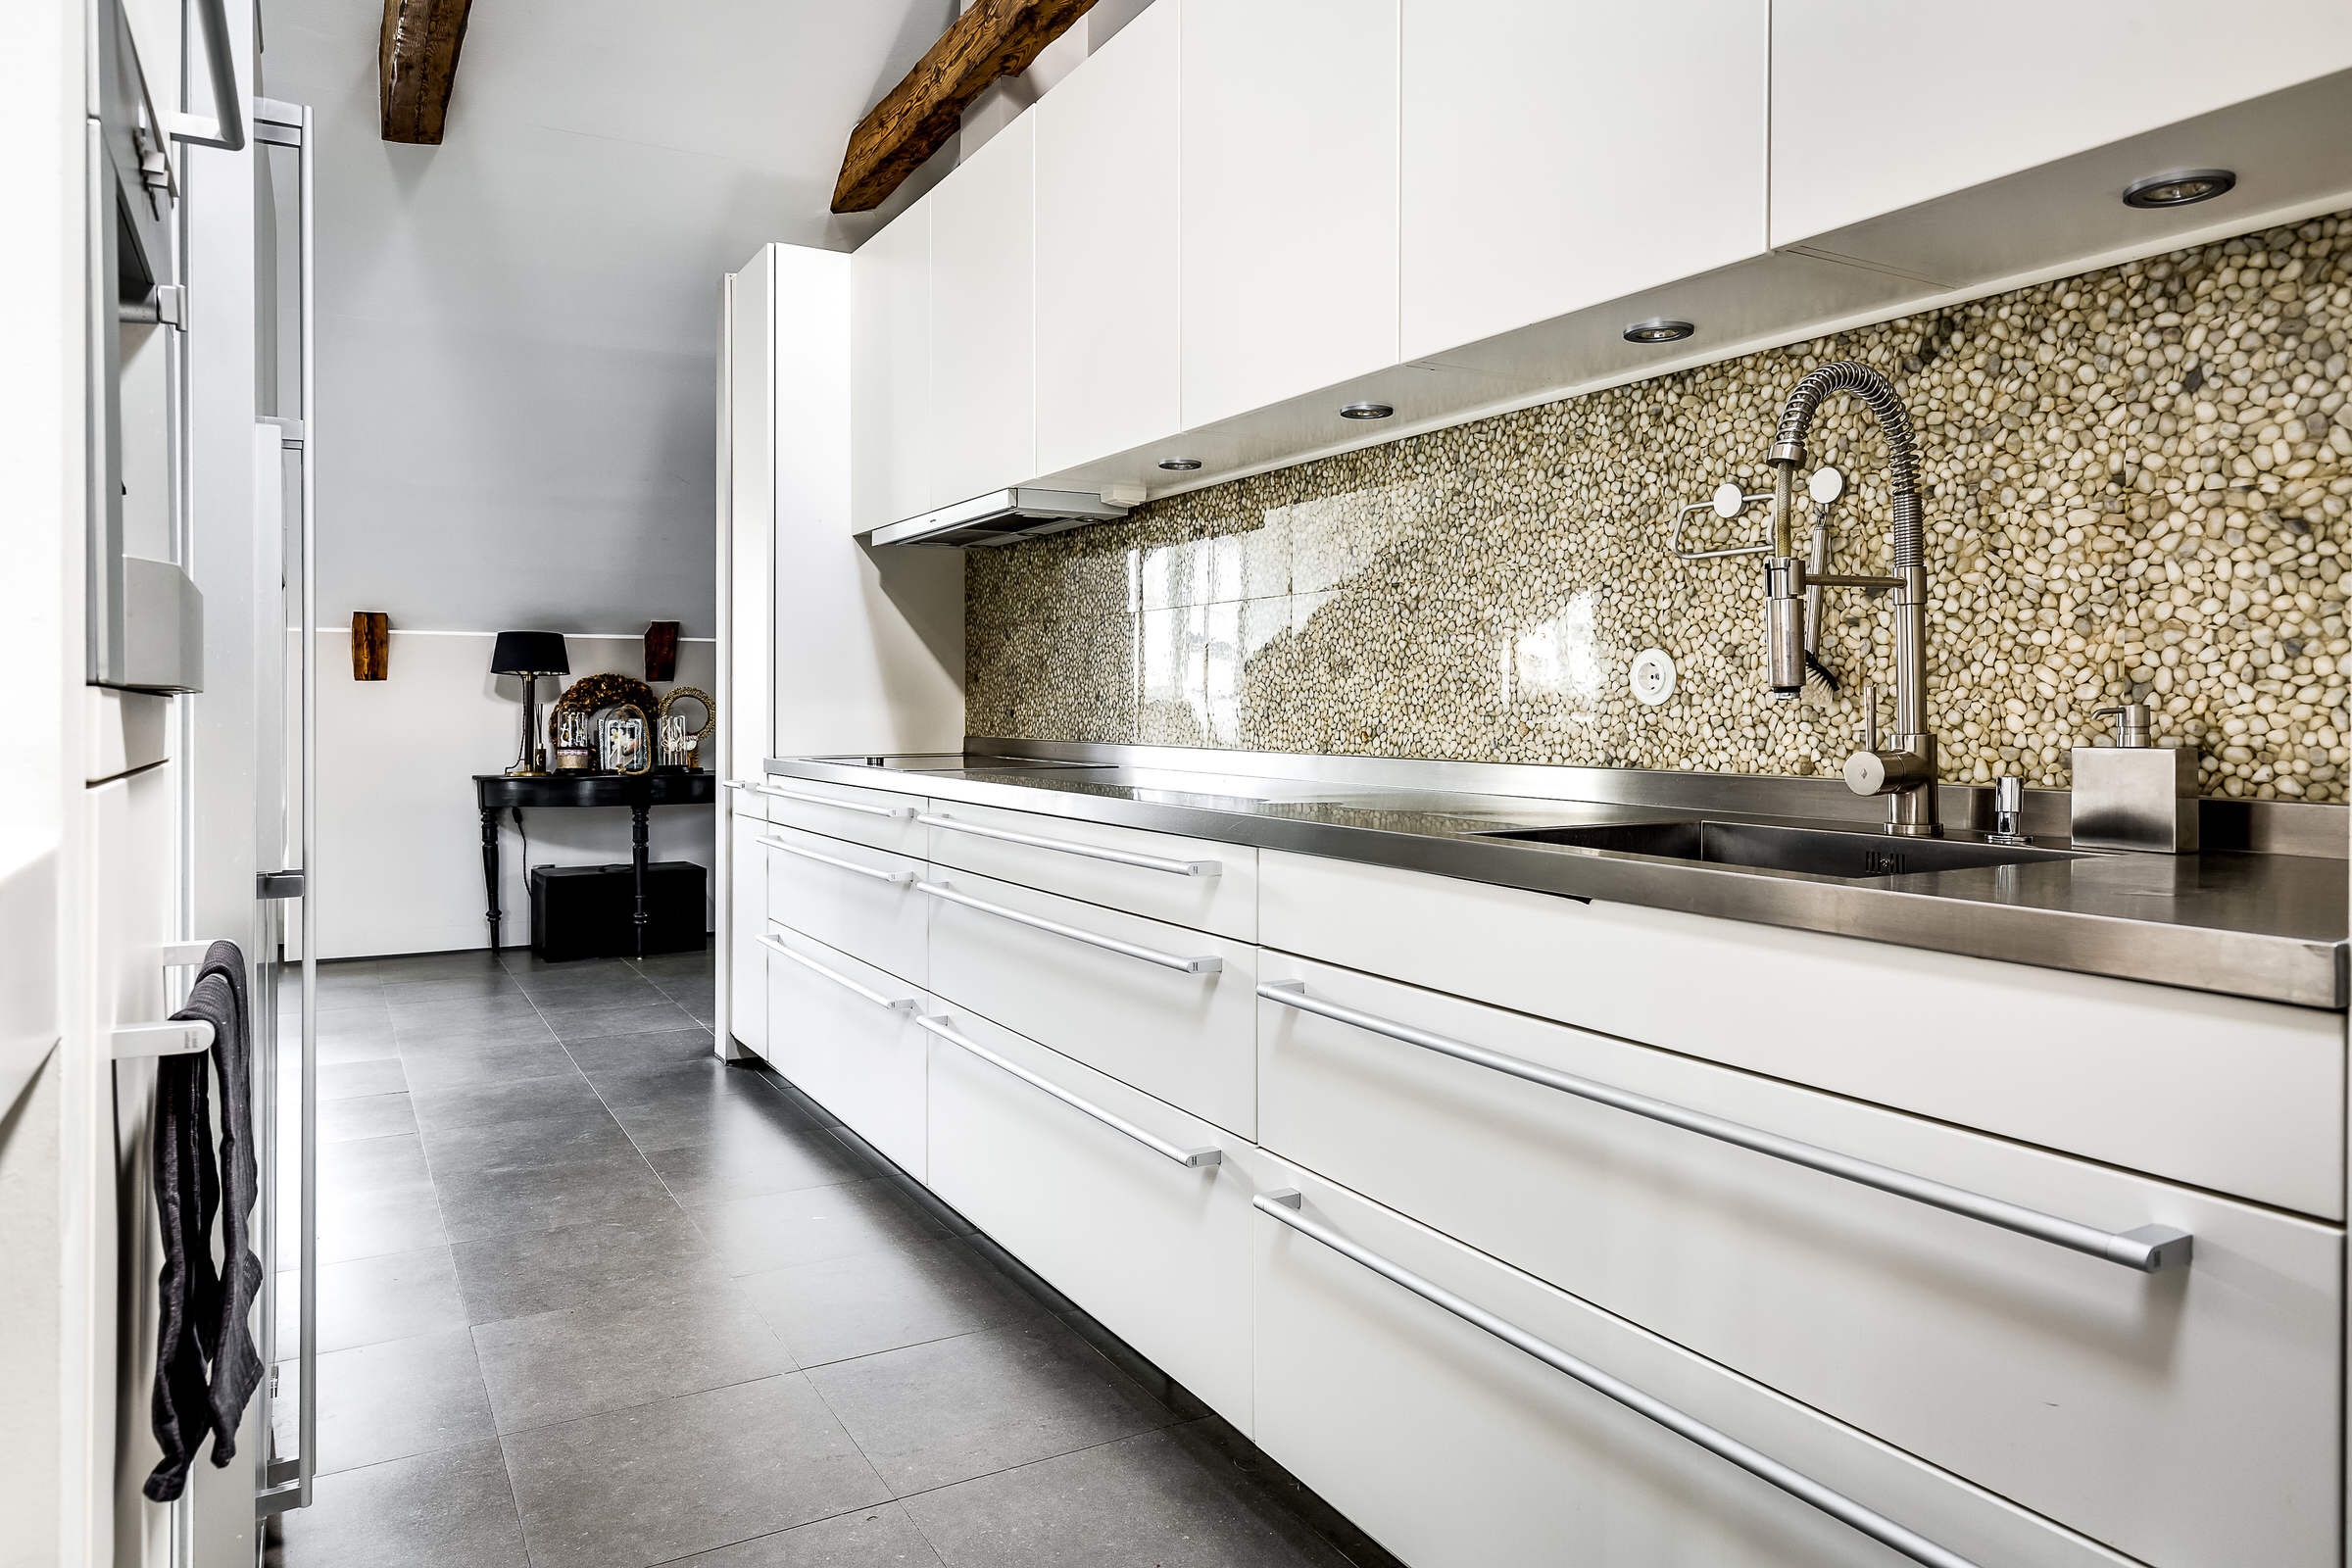 кухня белые фасады золотой фартук